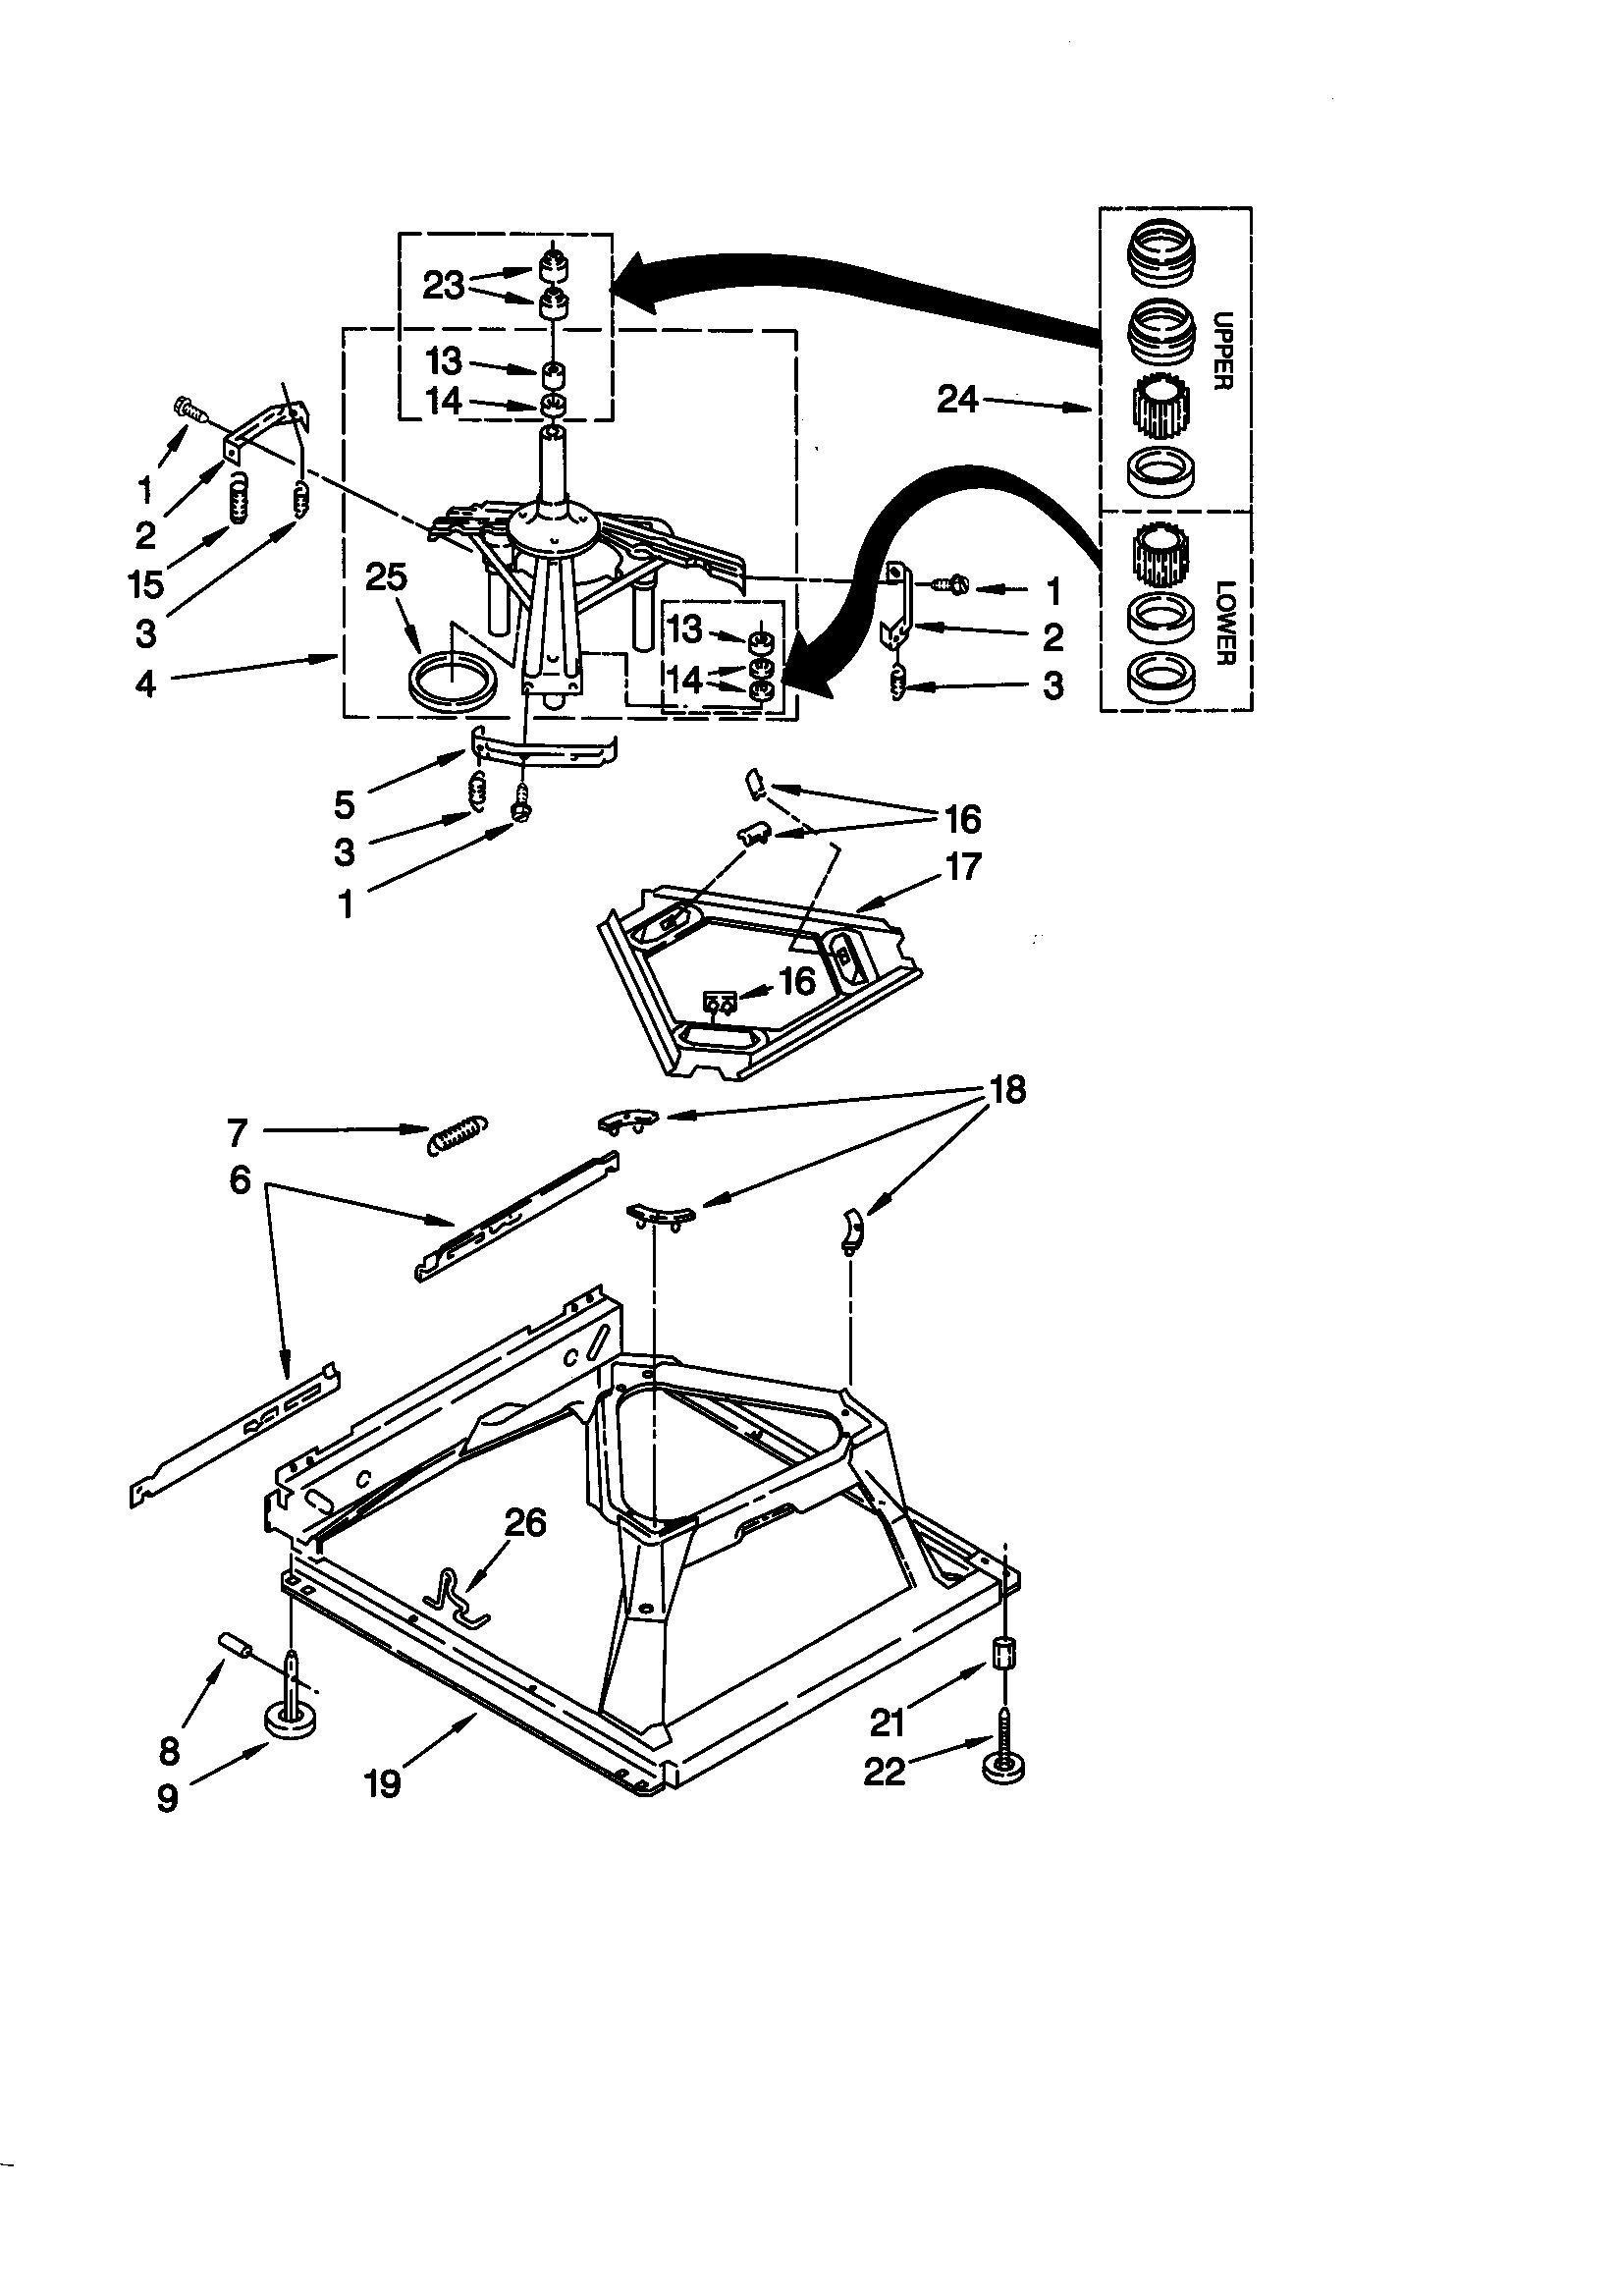 hight resolution of kenmore 11029852991 machine base diagram